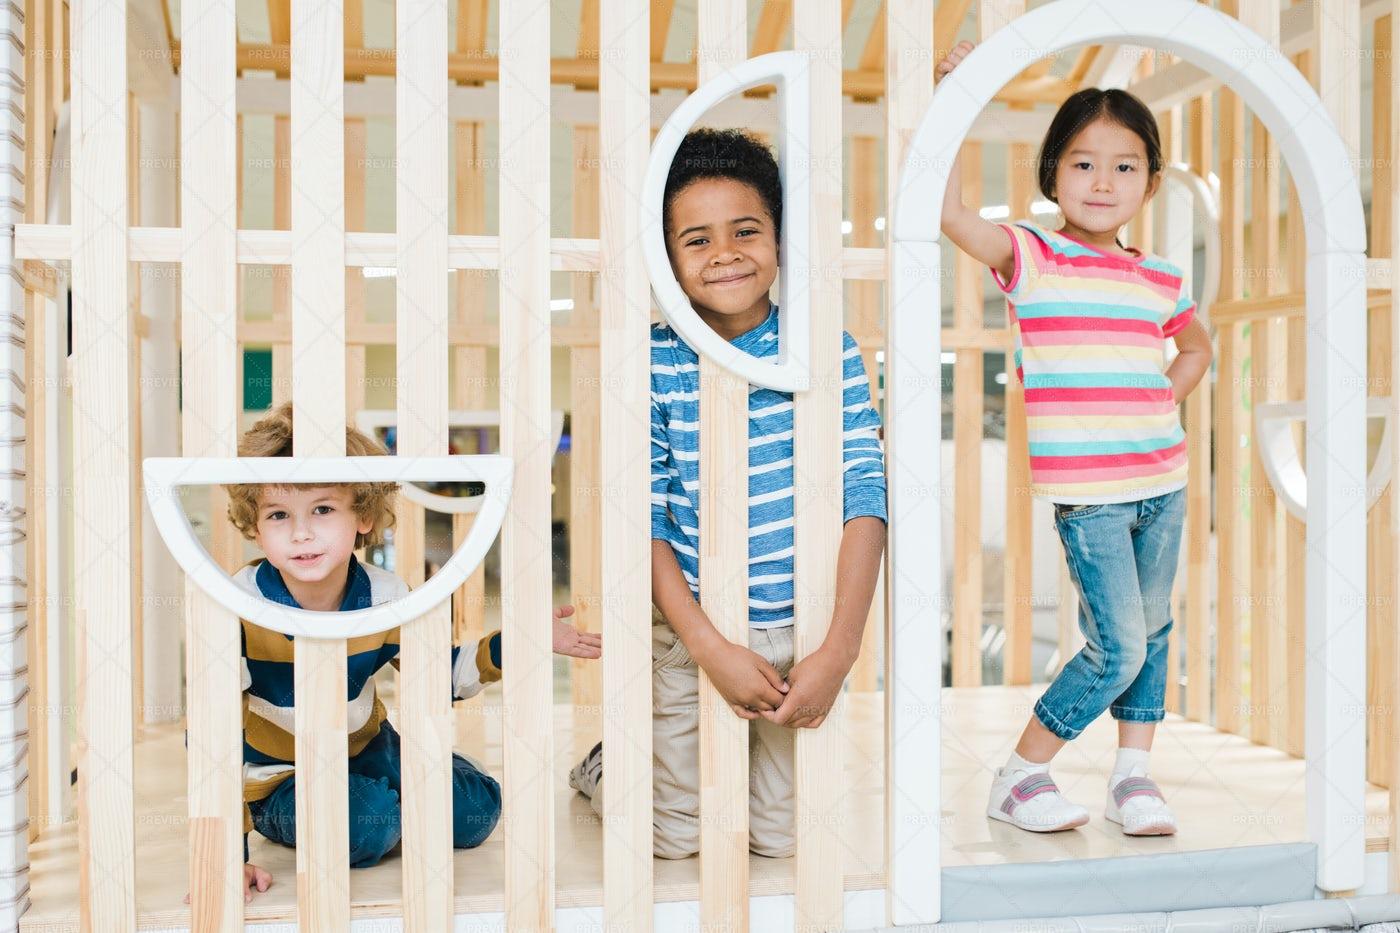 Three Cute Kids Of Asian, Caucasian...: Stock Photos